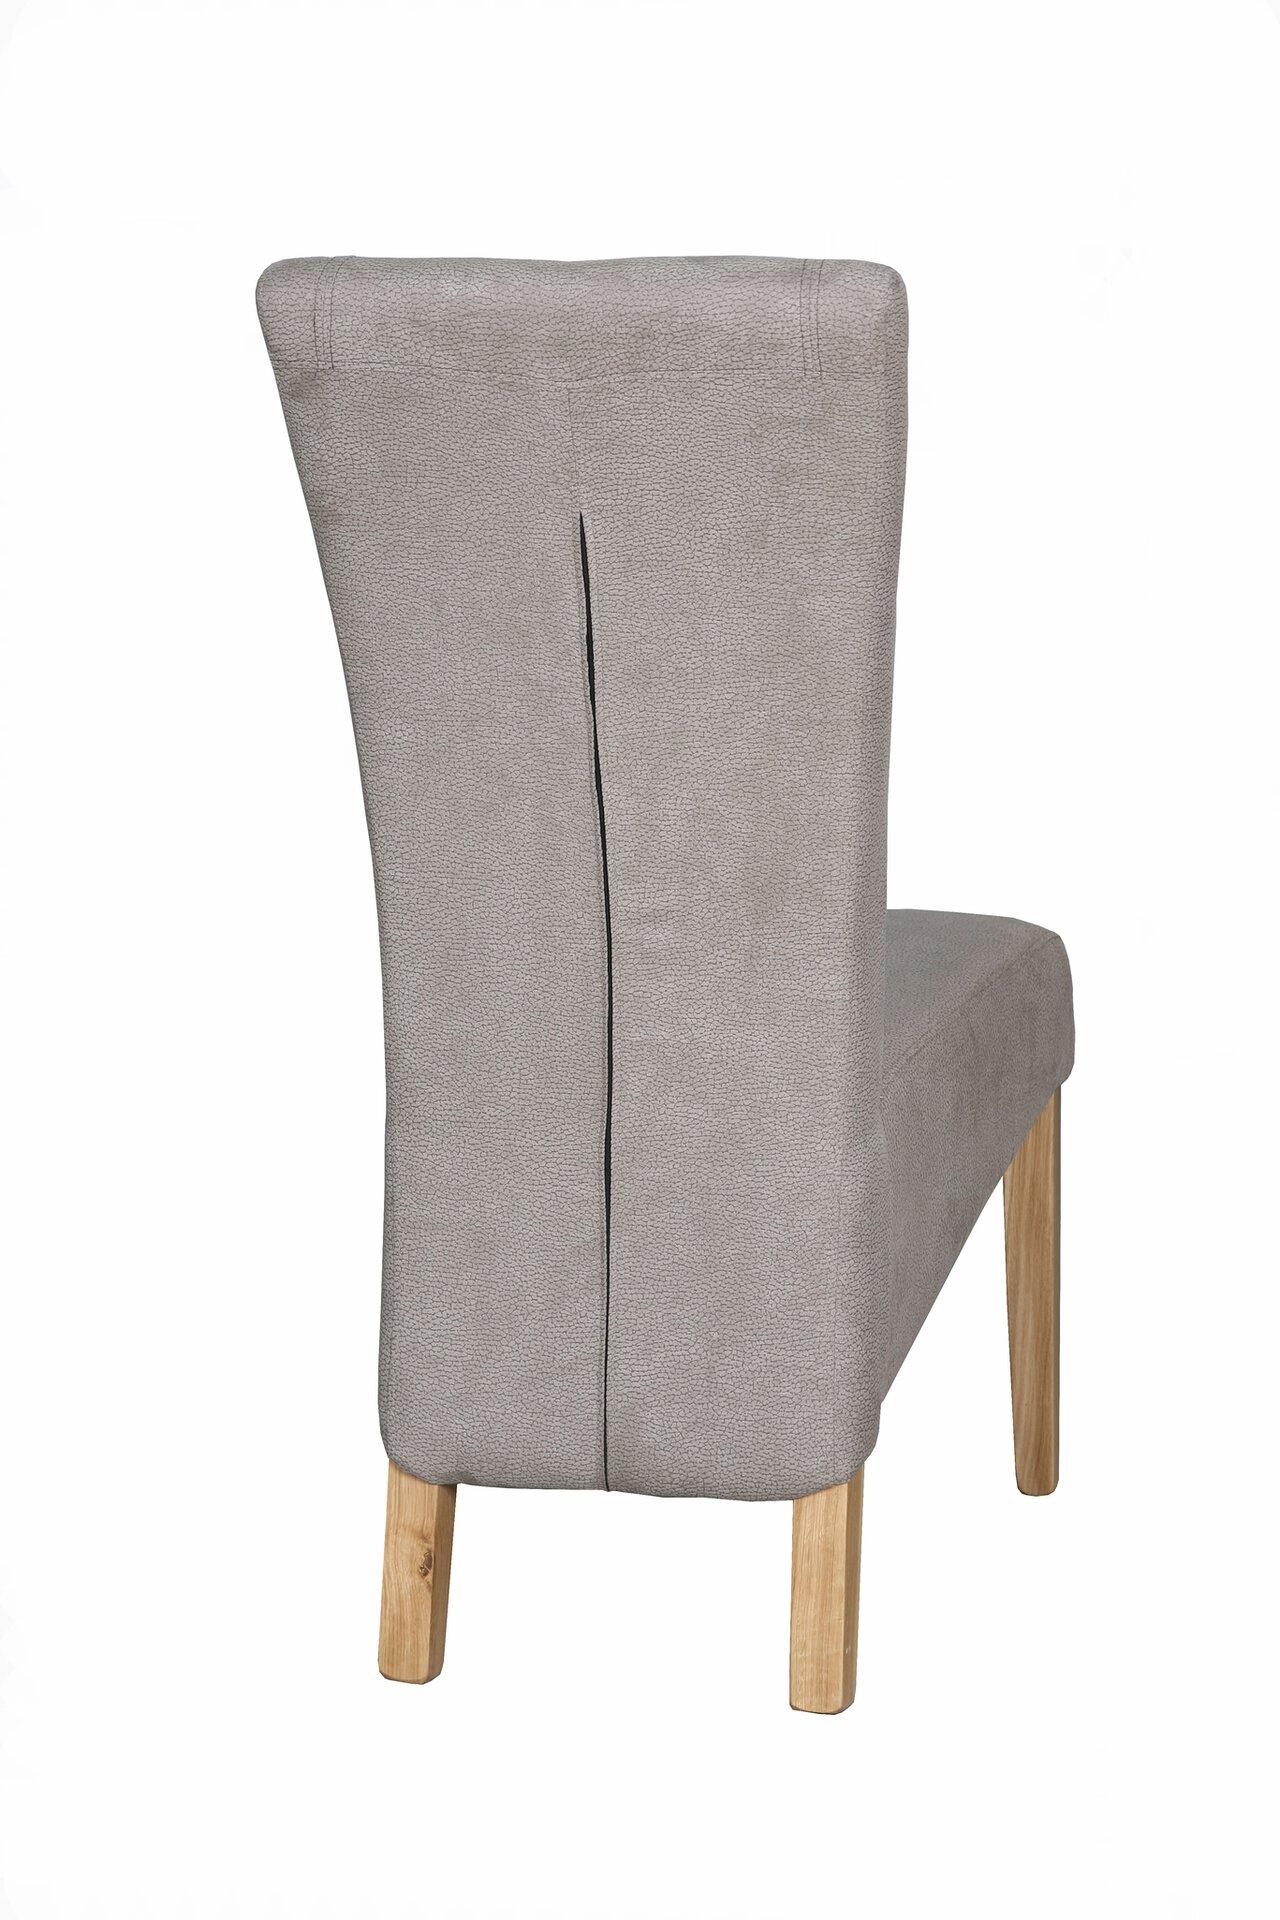 Stuhl CASHBA Vito Textil mehrfarbig 64 x 105 x 48 cm